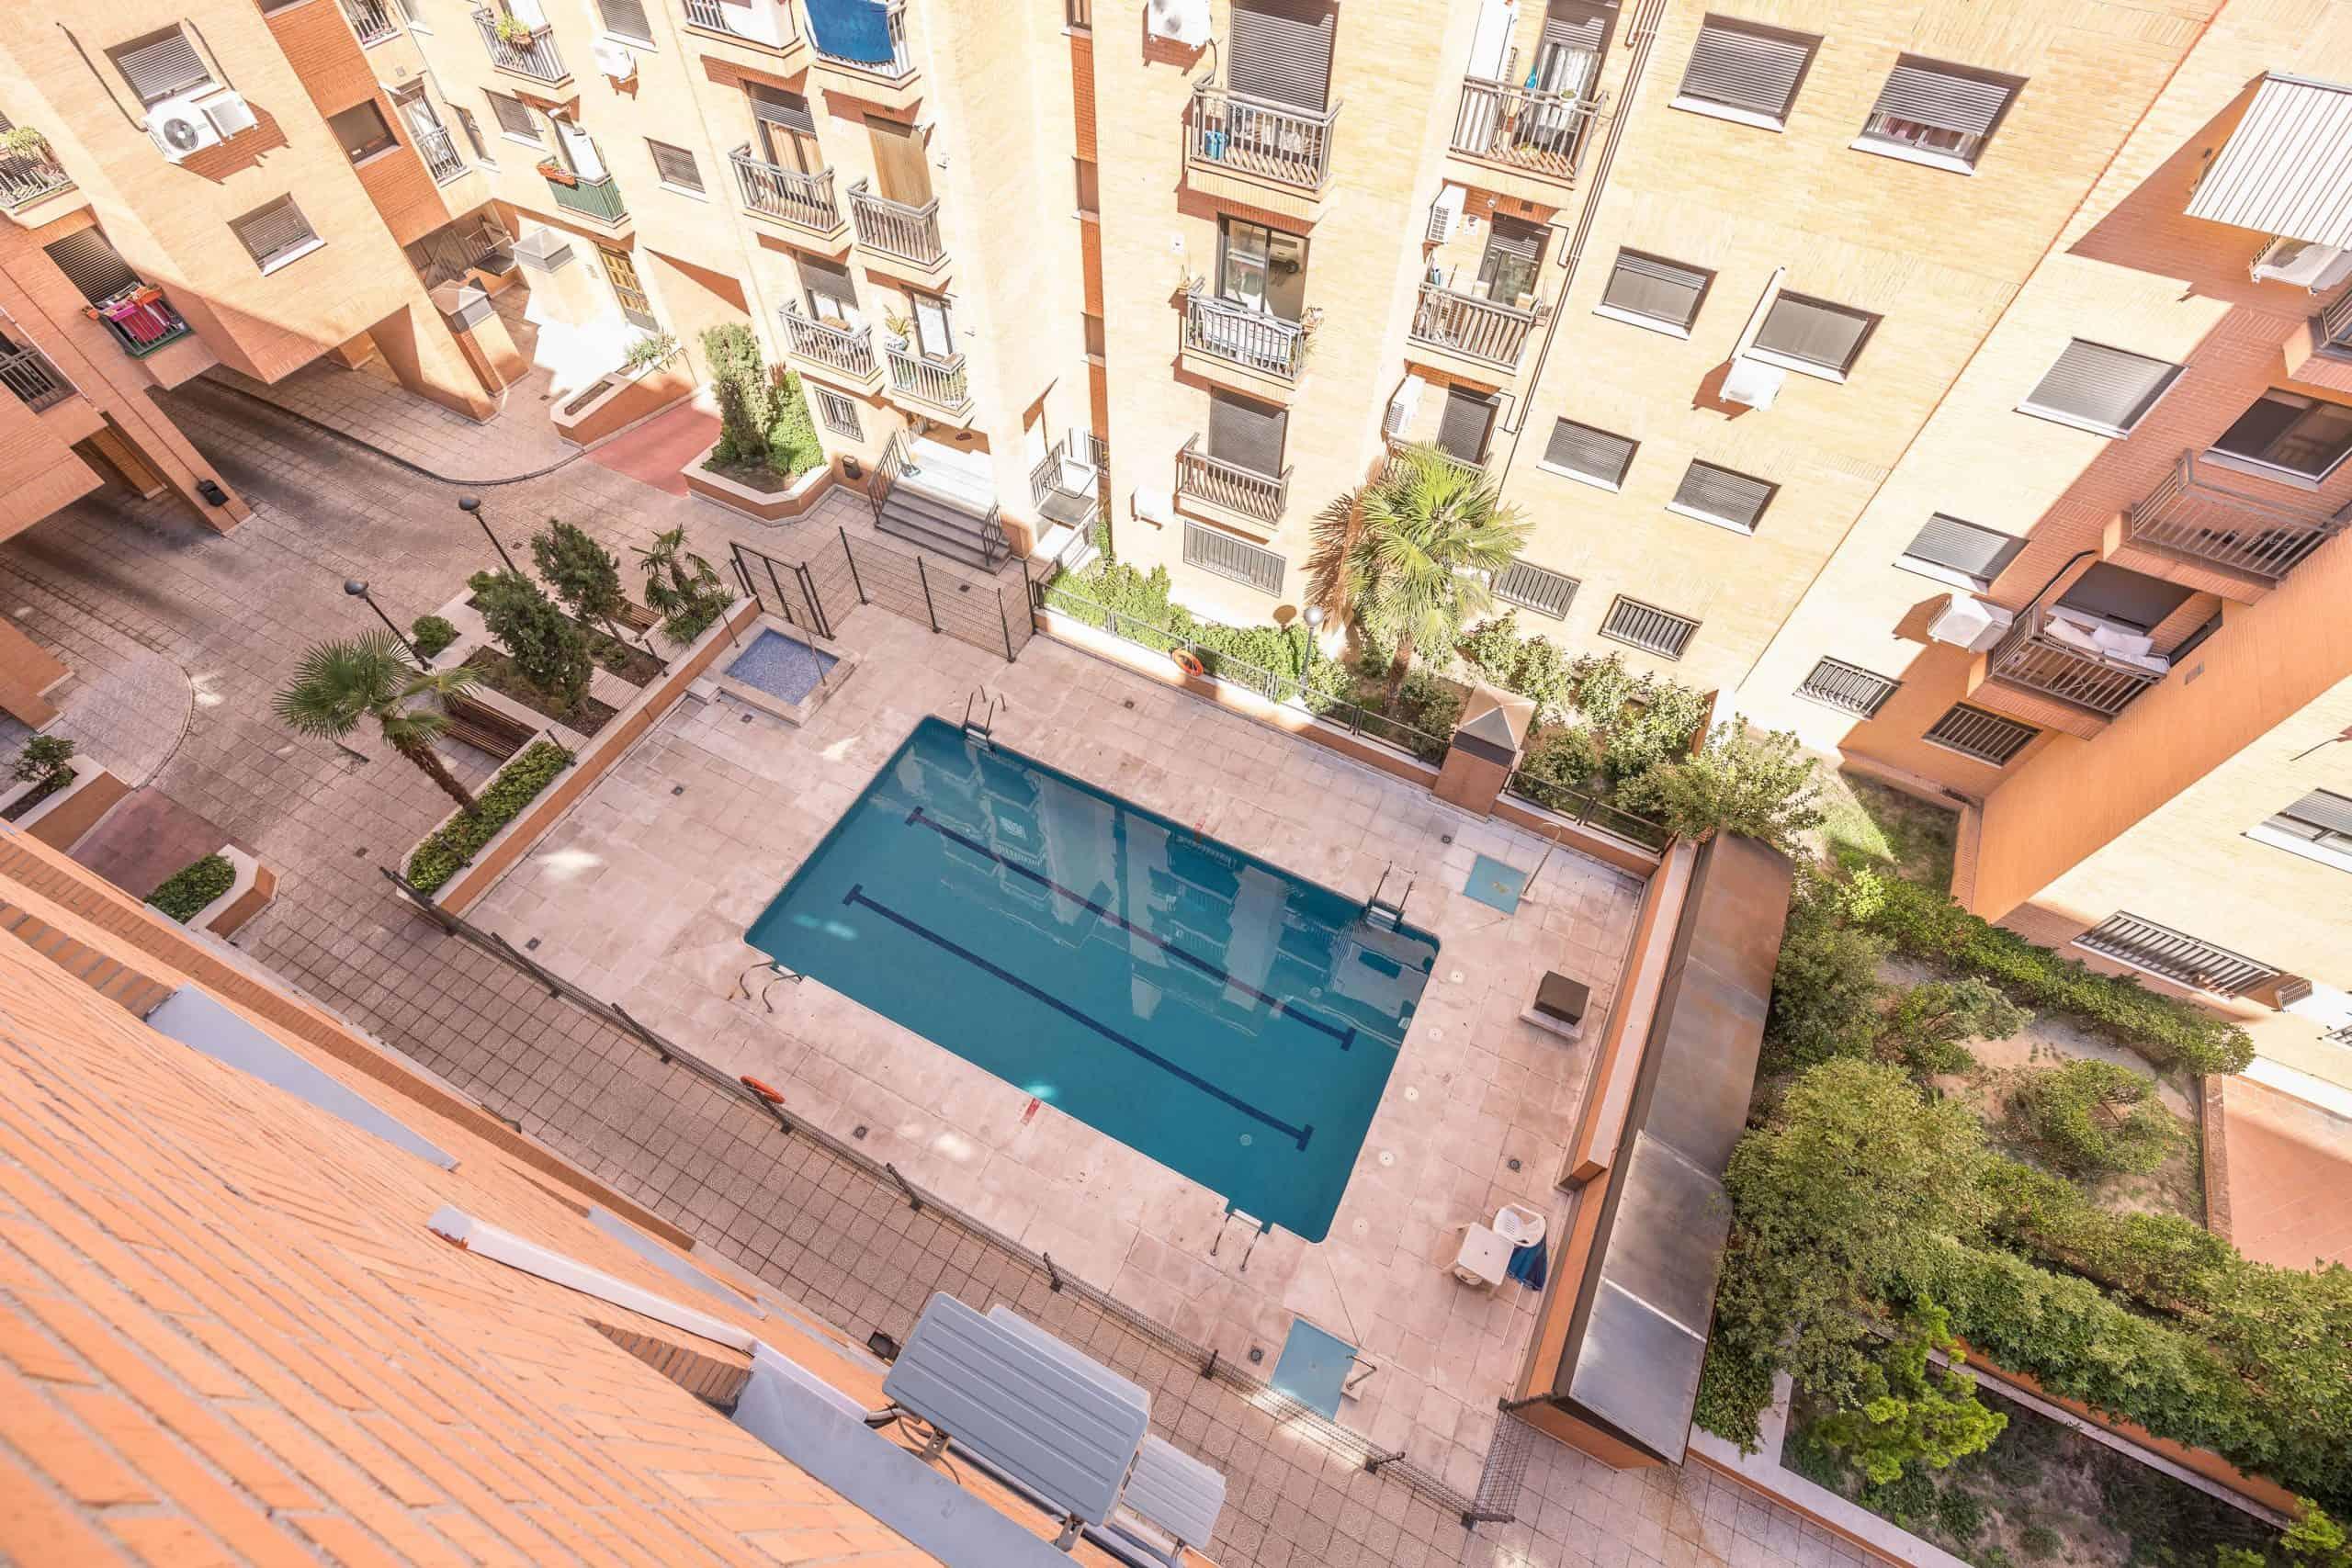 Agencia Inmobiliaria de Madrid-FUTUROCASA-Zona ARGANZUELA-EMBAJADORES-LEGAZPI13 VISTAS (4)